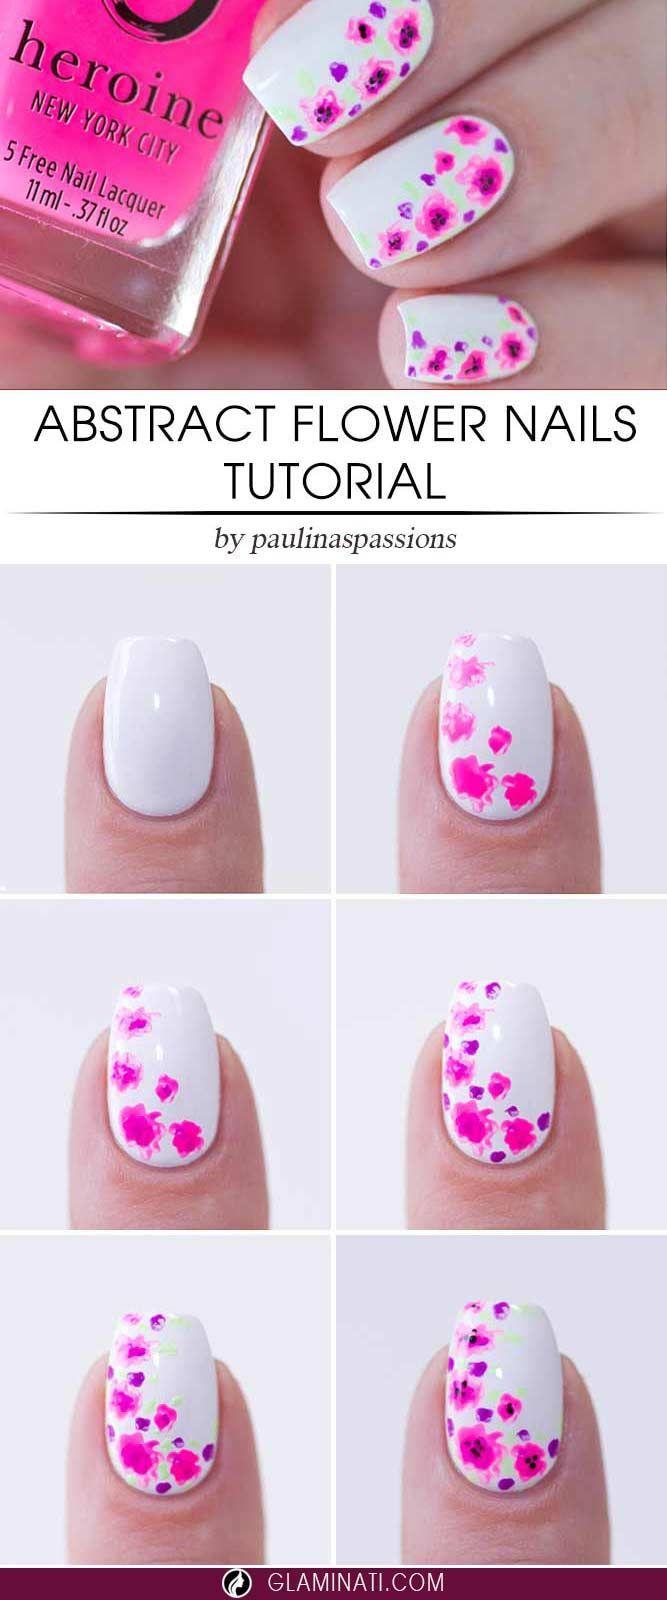 3486 best Nail Art Hacks images on Pinterest | Nail scissors, Nail ...